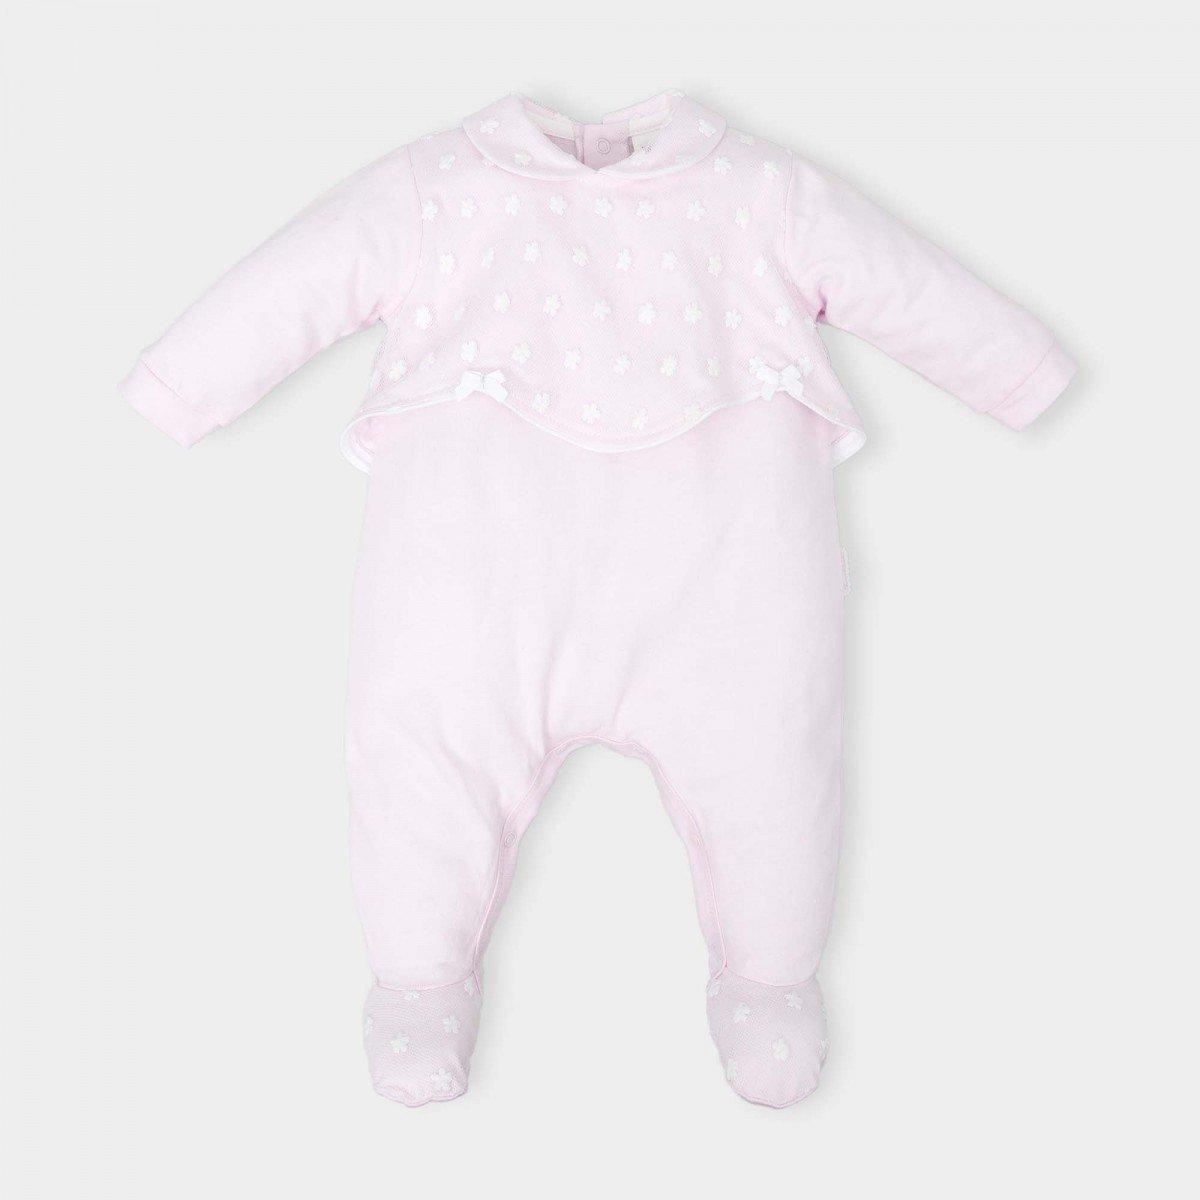 1-delige-pyjama-roze-bovenstuk-voile-witte-bloempjes